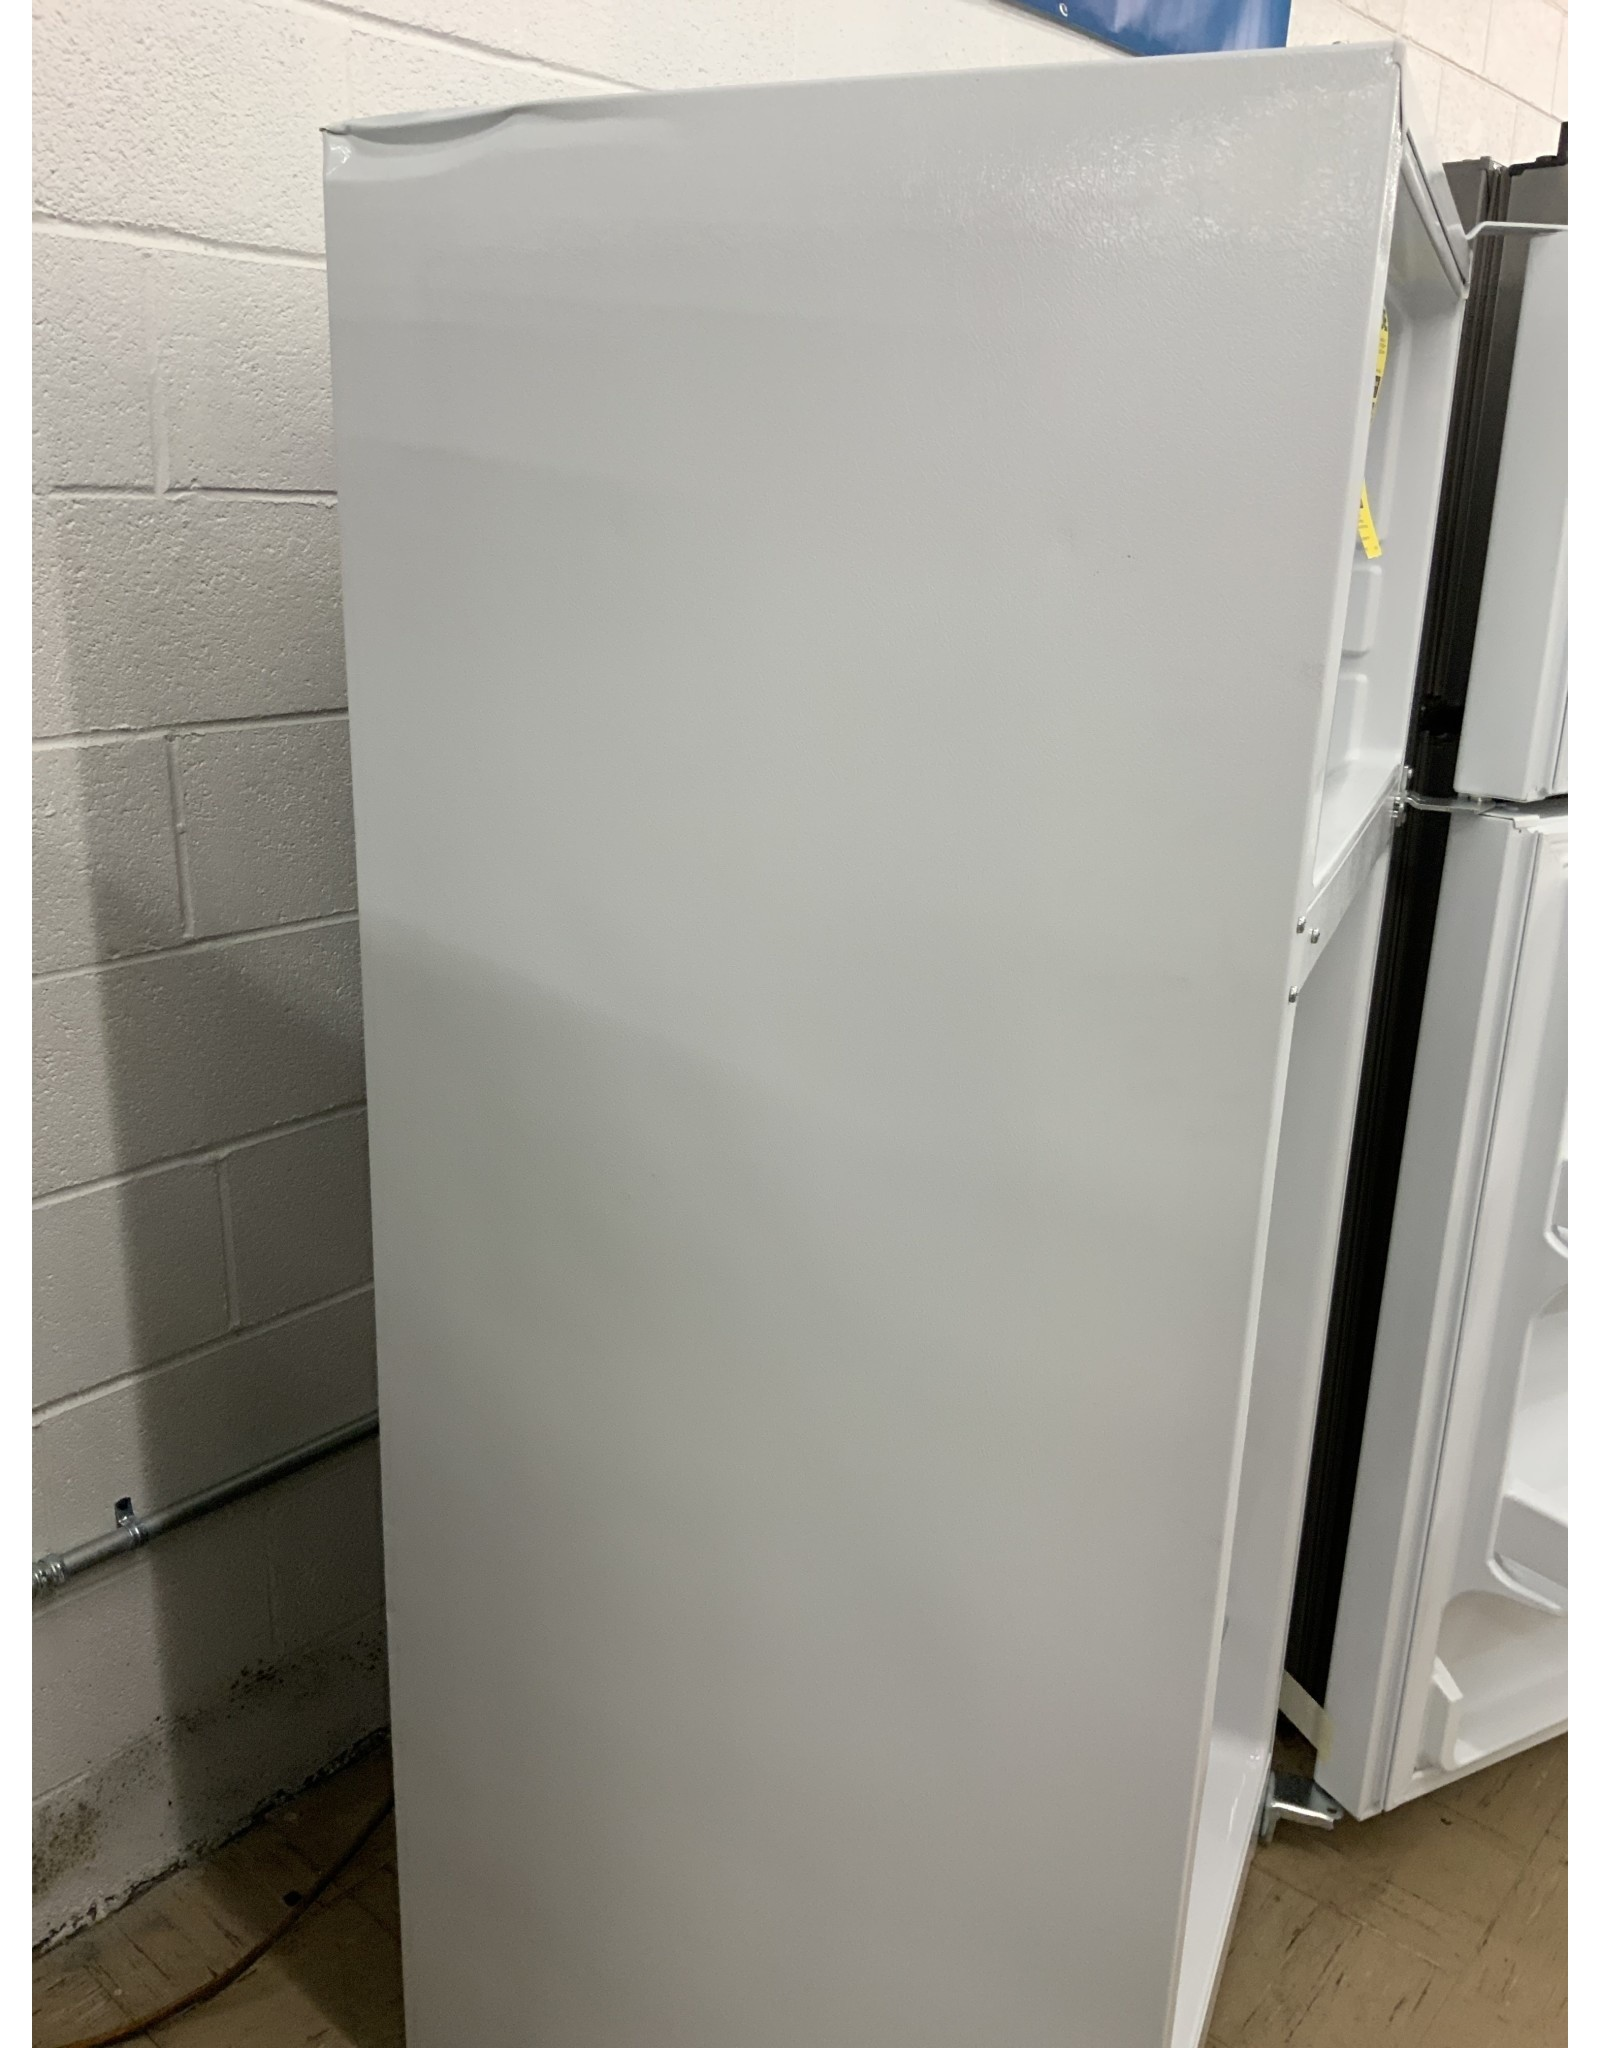 GE GTS17DTNRWW 16.6 cu. ft. Top Freezer Refrigerator in White